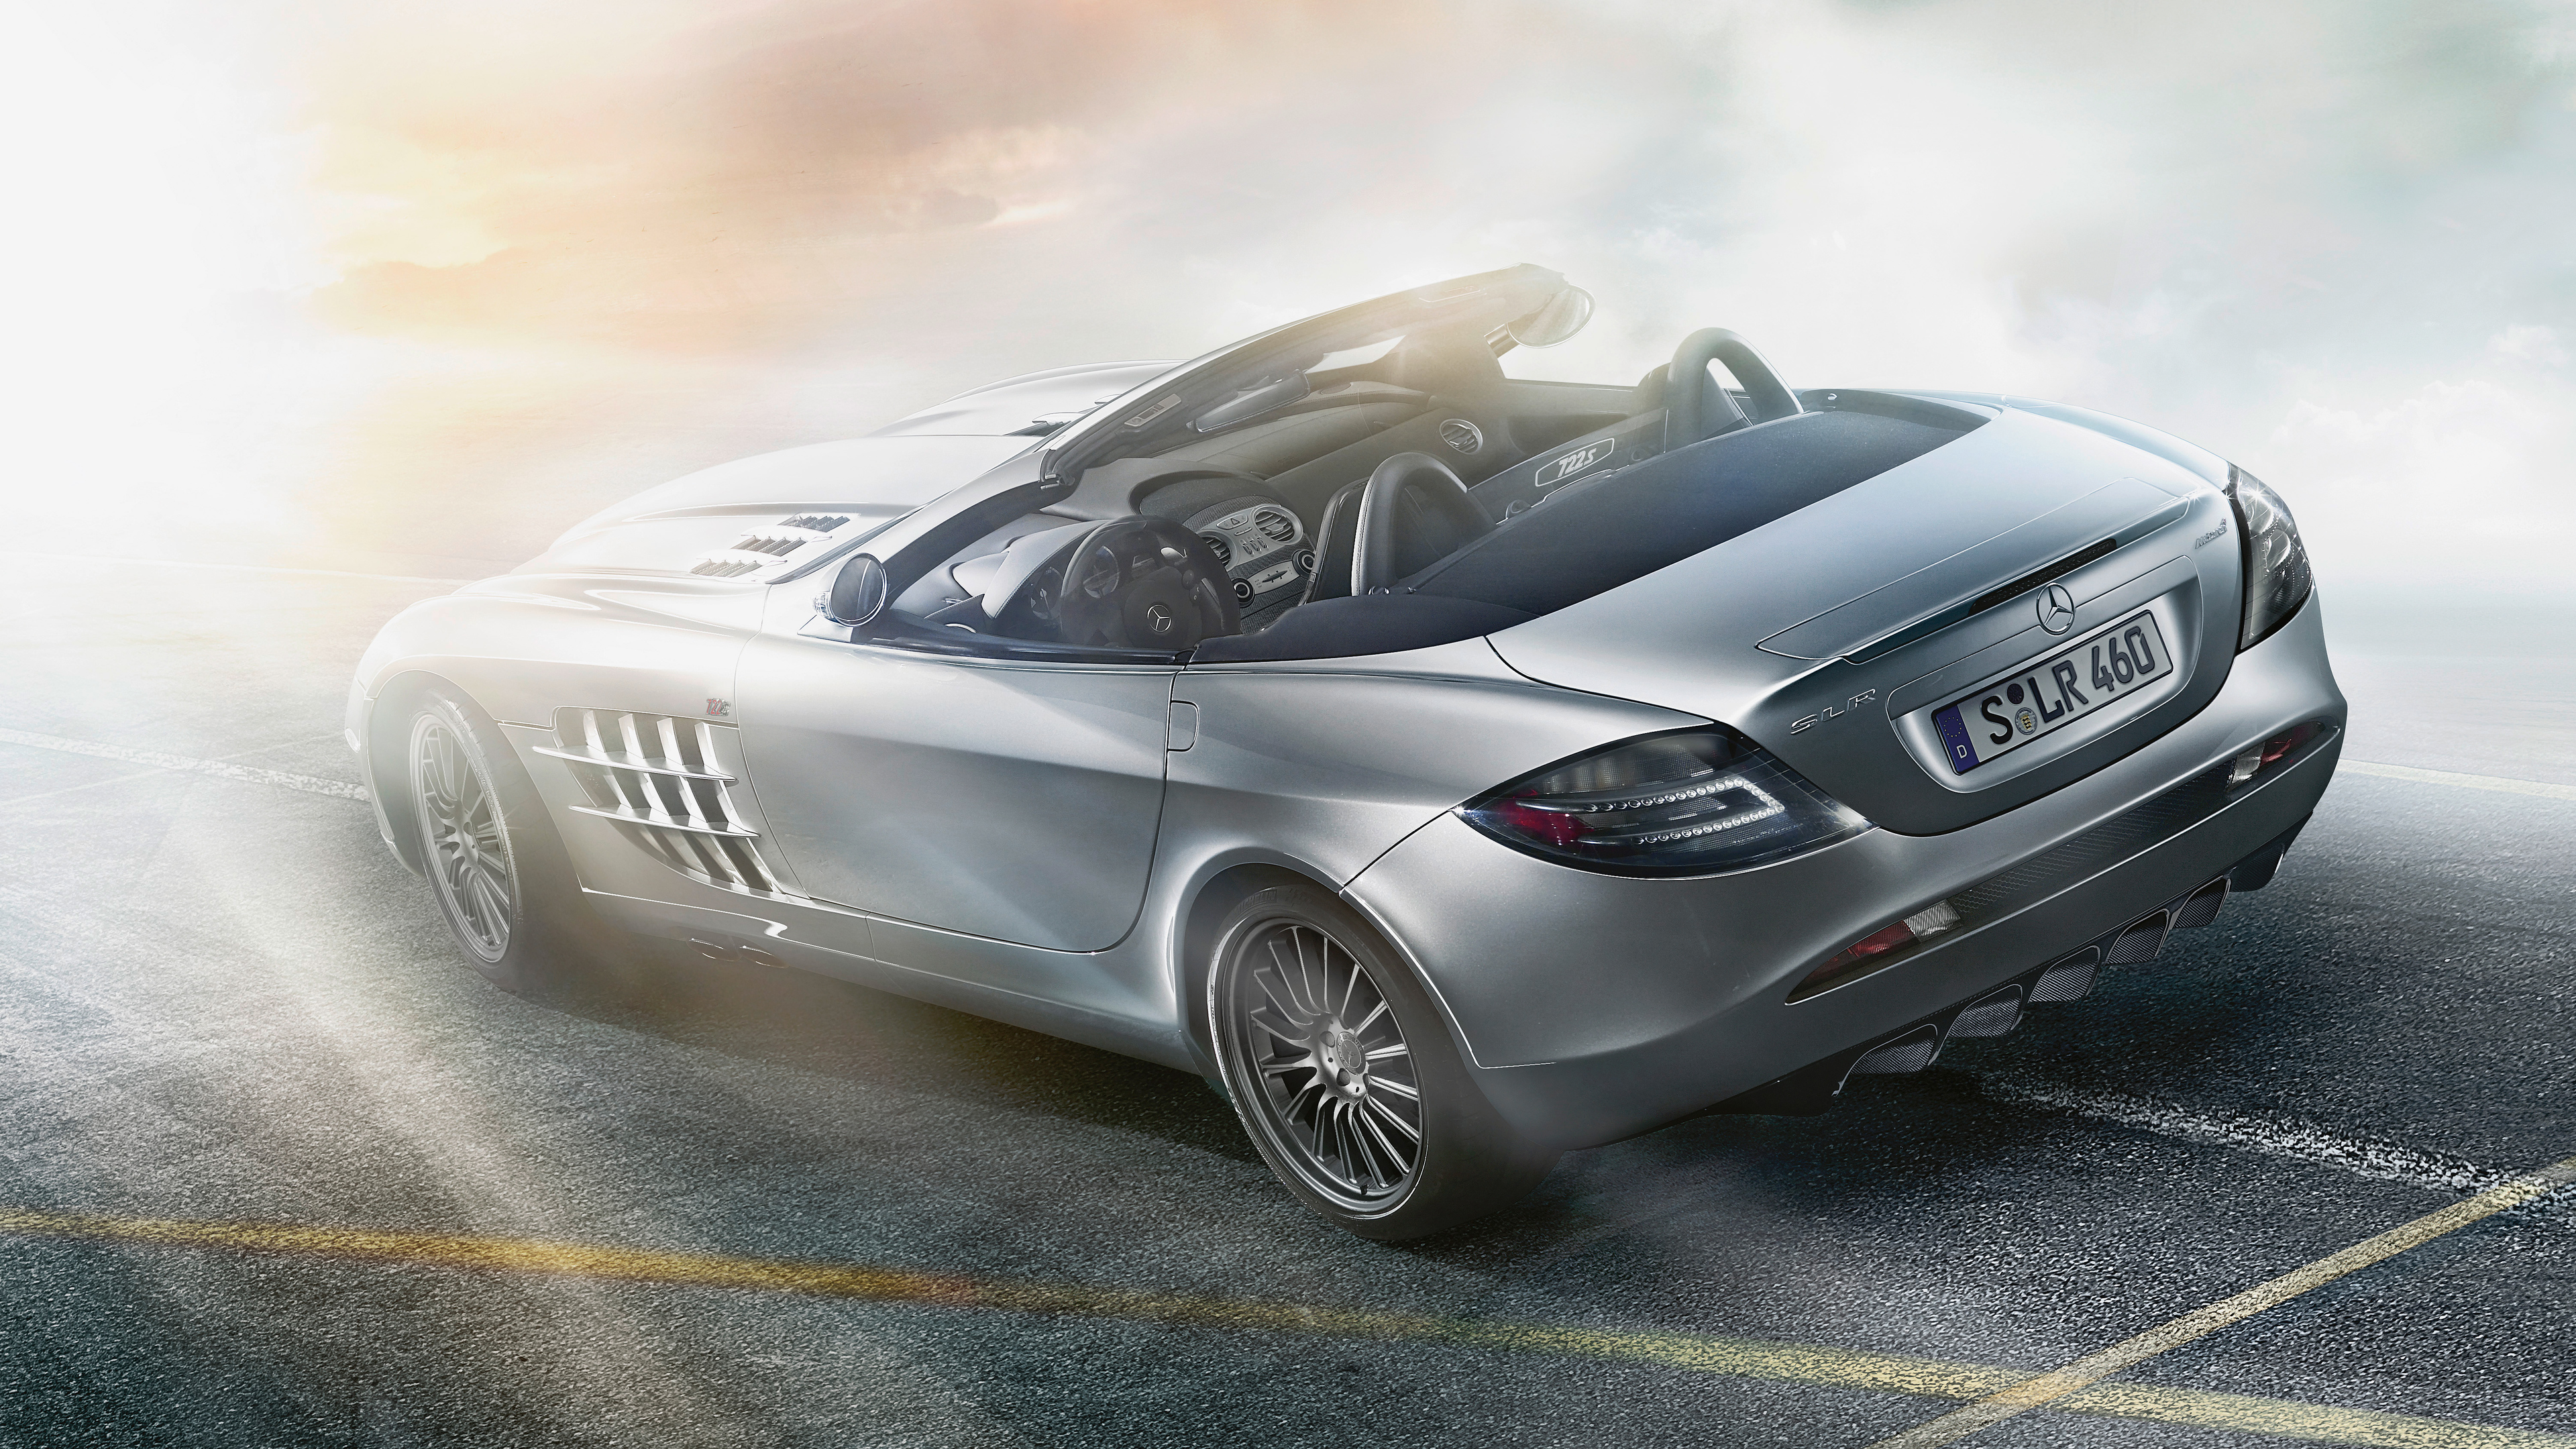 mercedes benz slr mclaren roadster rear 4k 1554245276 - Mercedes Benz SLR McLaren Roadster Rear 4k - mercedes wallpapers, mercedes benz wallpapers, hd-wallpapers, cars wallpapers, 8k wallpapers, 5k wallpapers, 4k-wallpapers